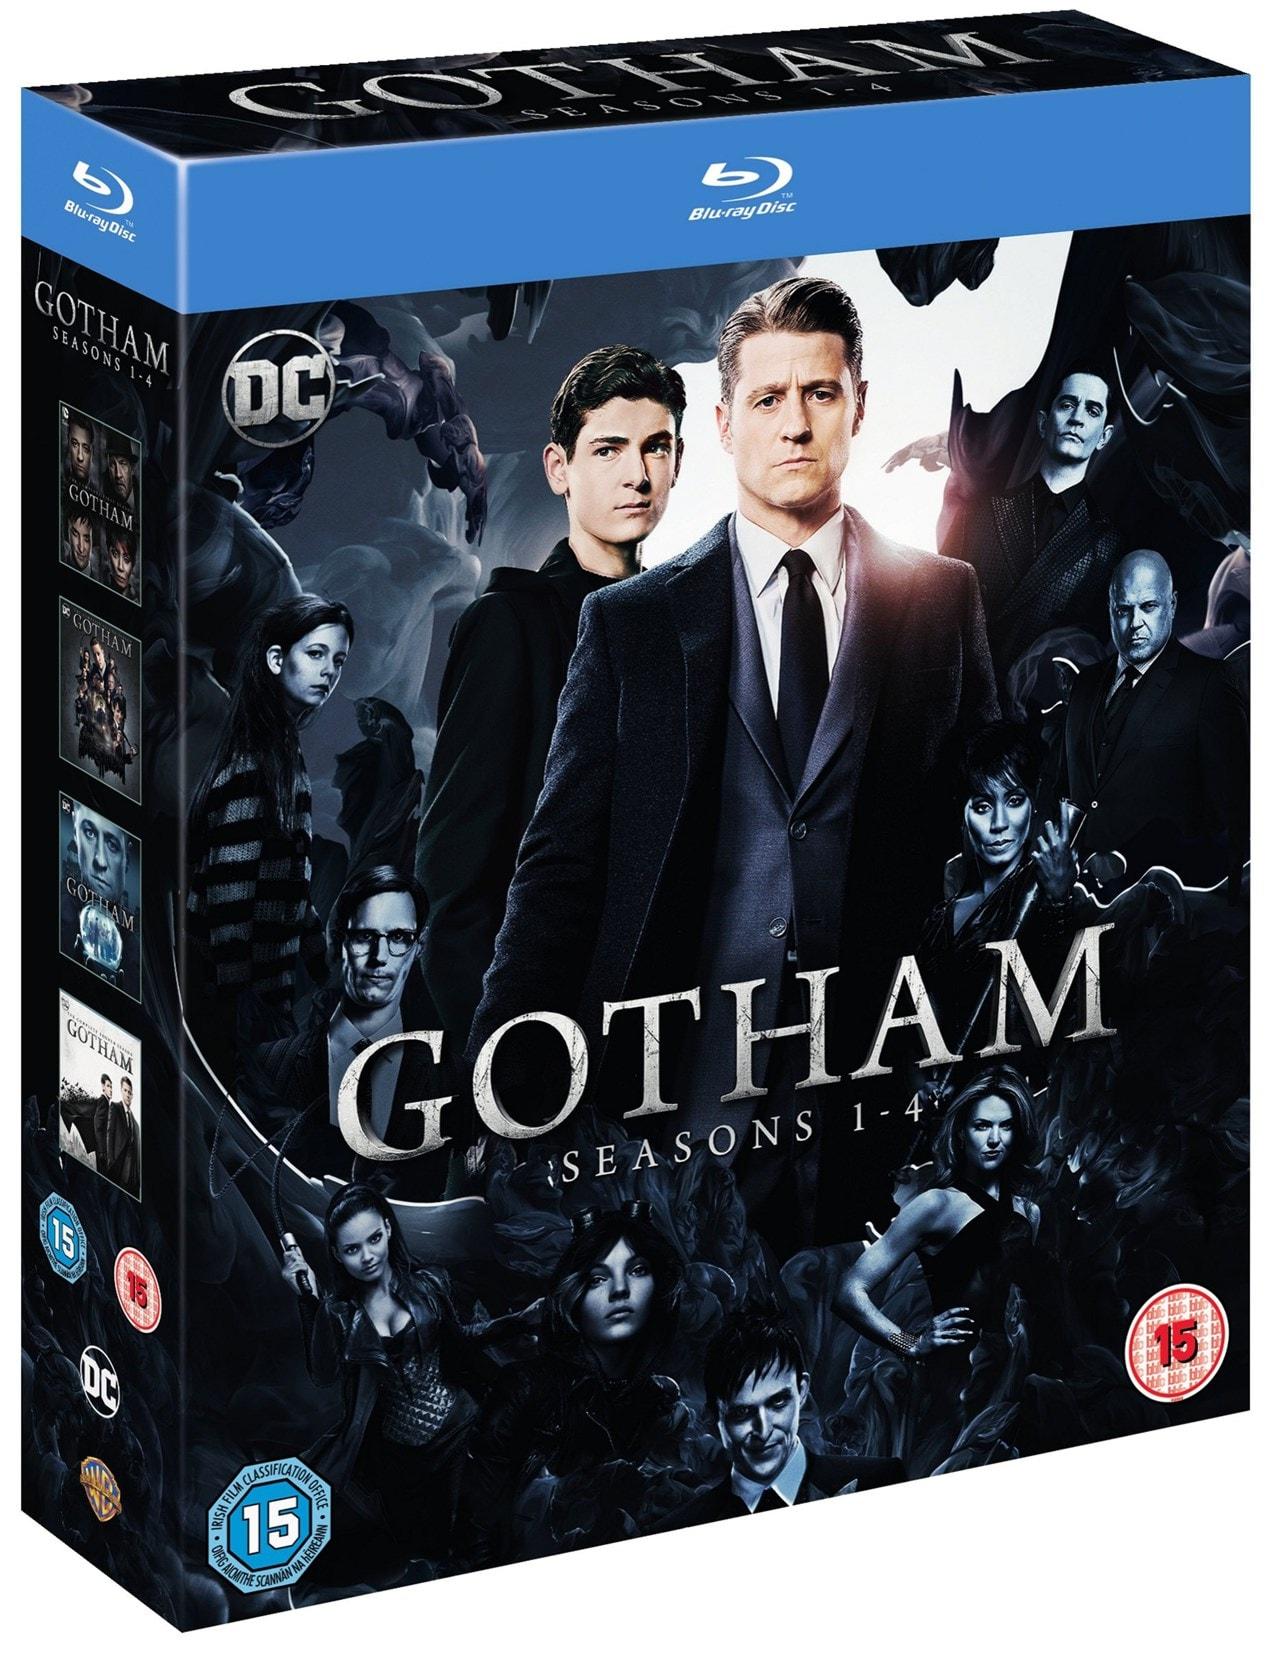 Gotham: Seasons 1-4 - 2